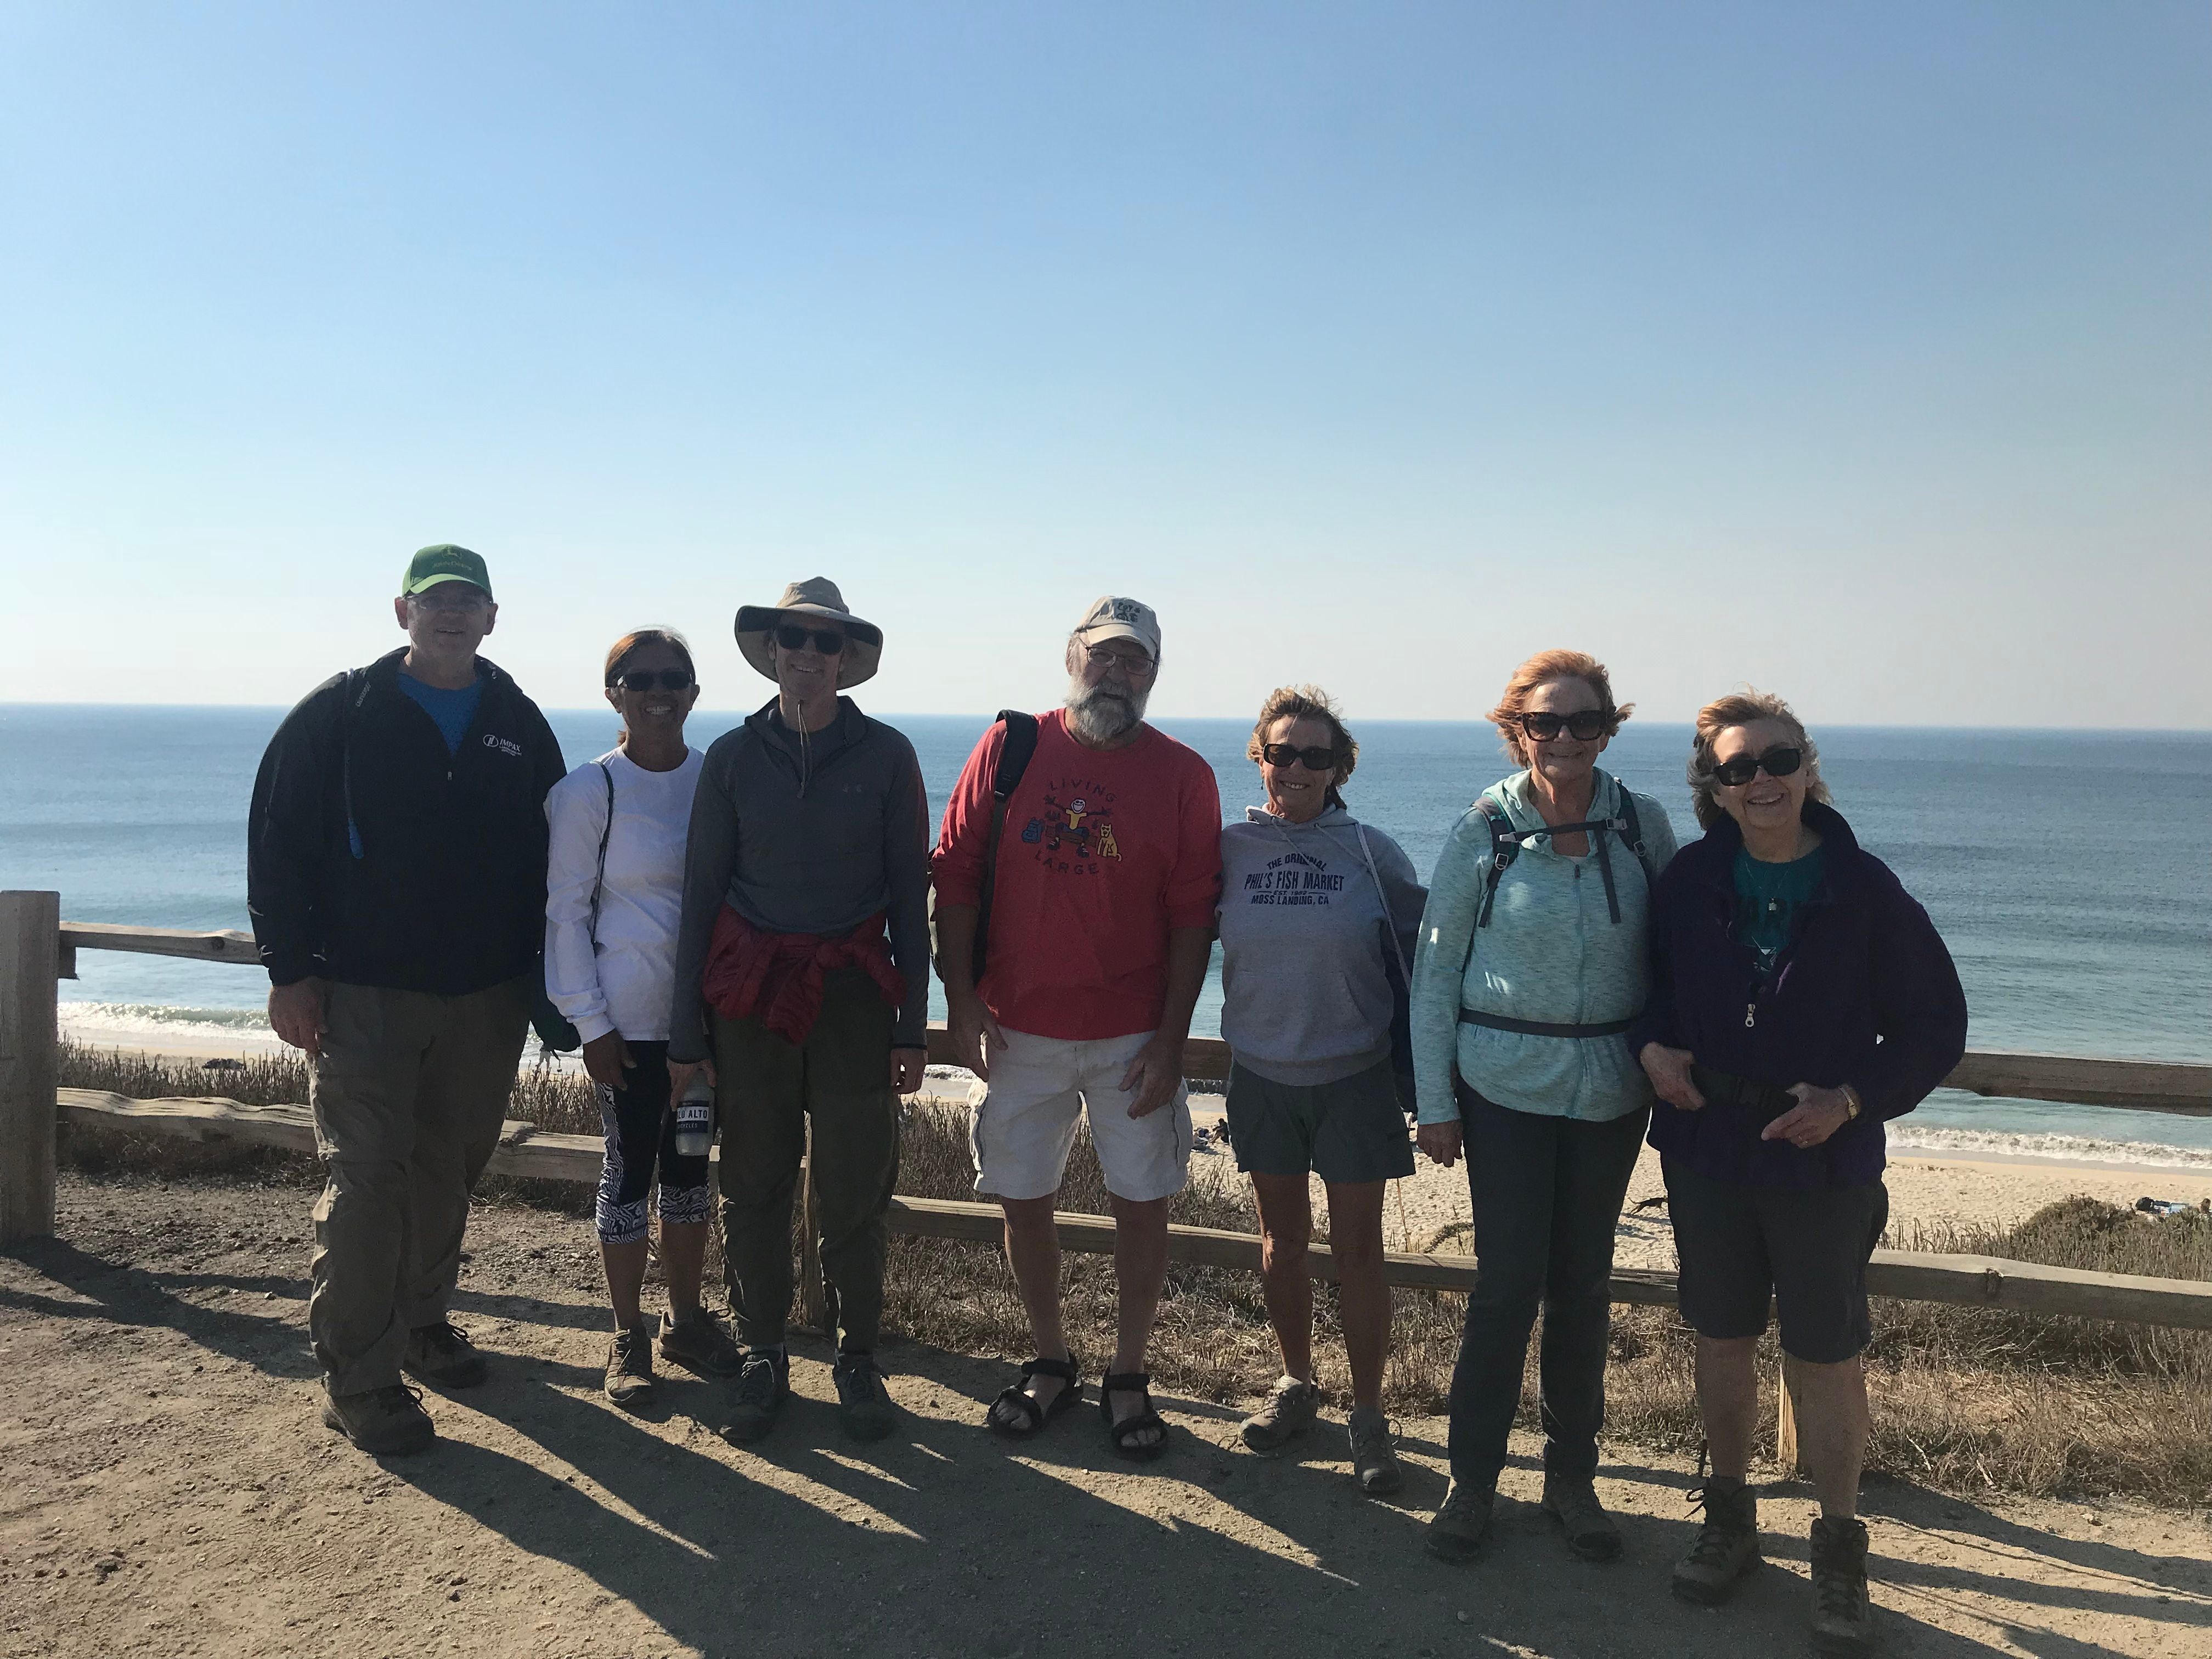 Photos - Singleaires Hiking Activity Group (Palo Alto, CA